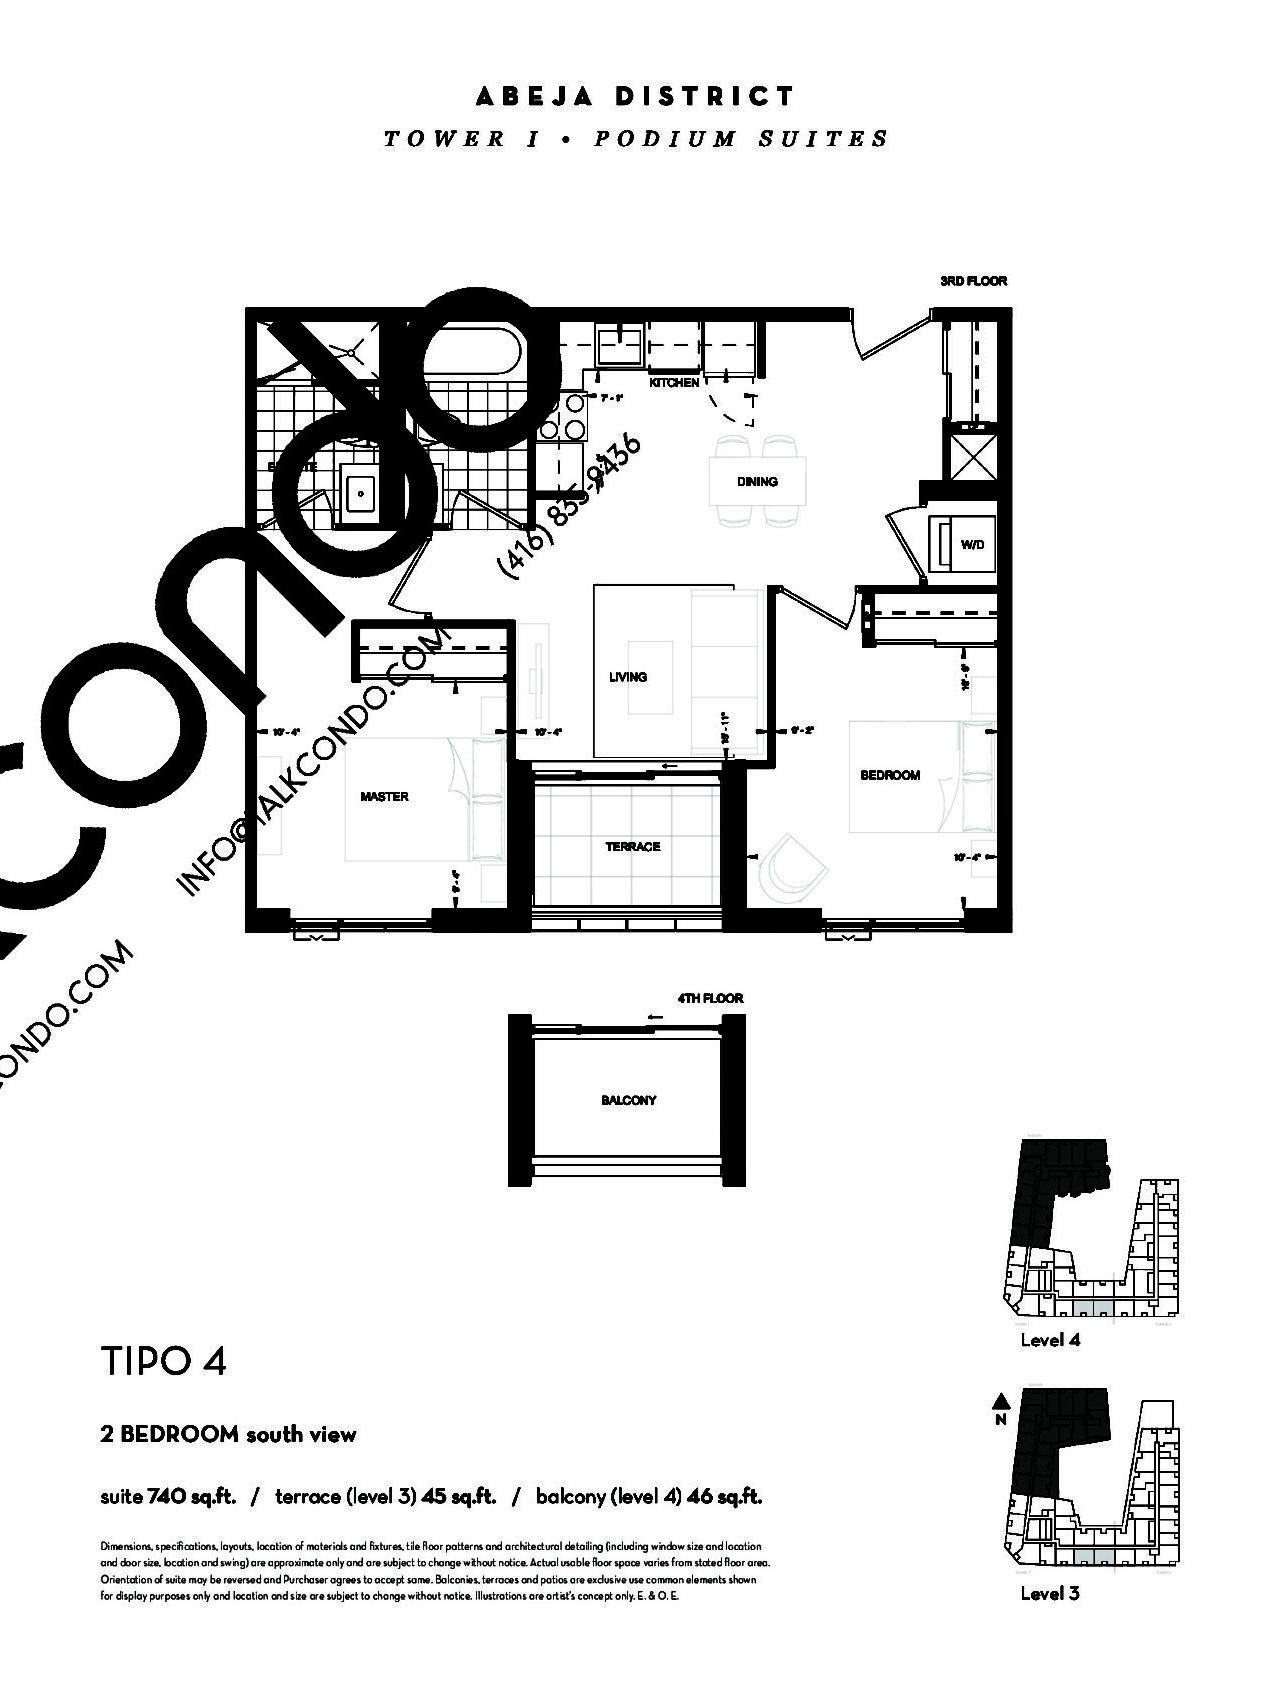 TIPO 4 (Podium) Floor Plan at Abeja District Condos - 740 sq.ft